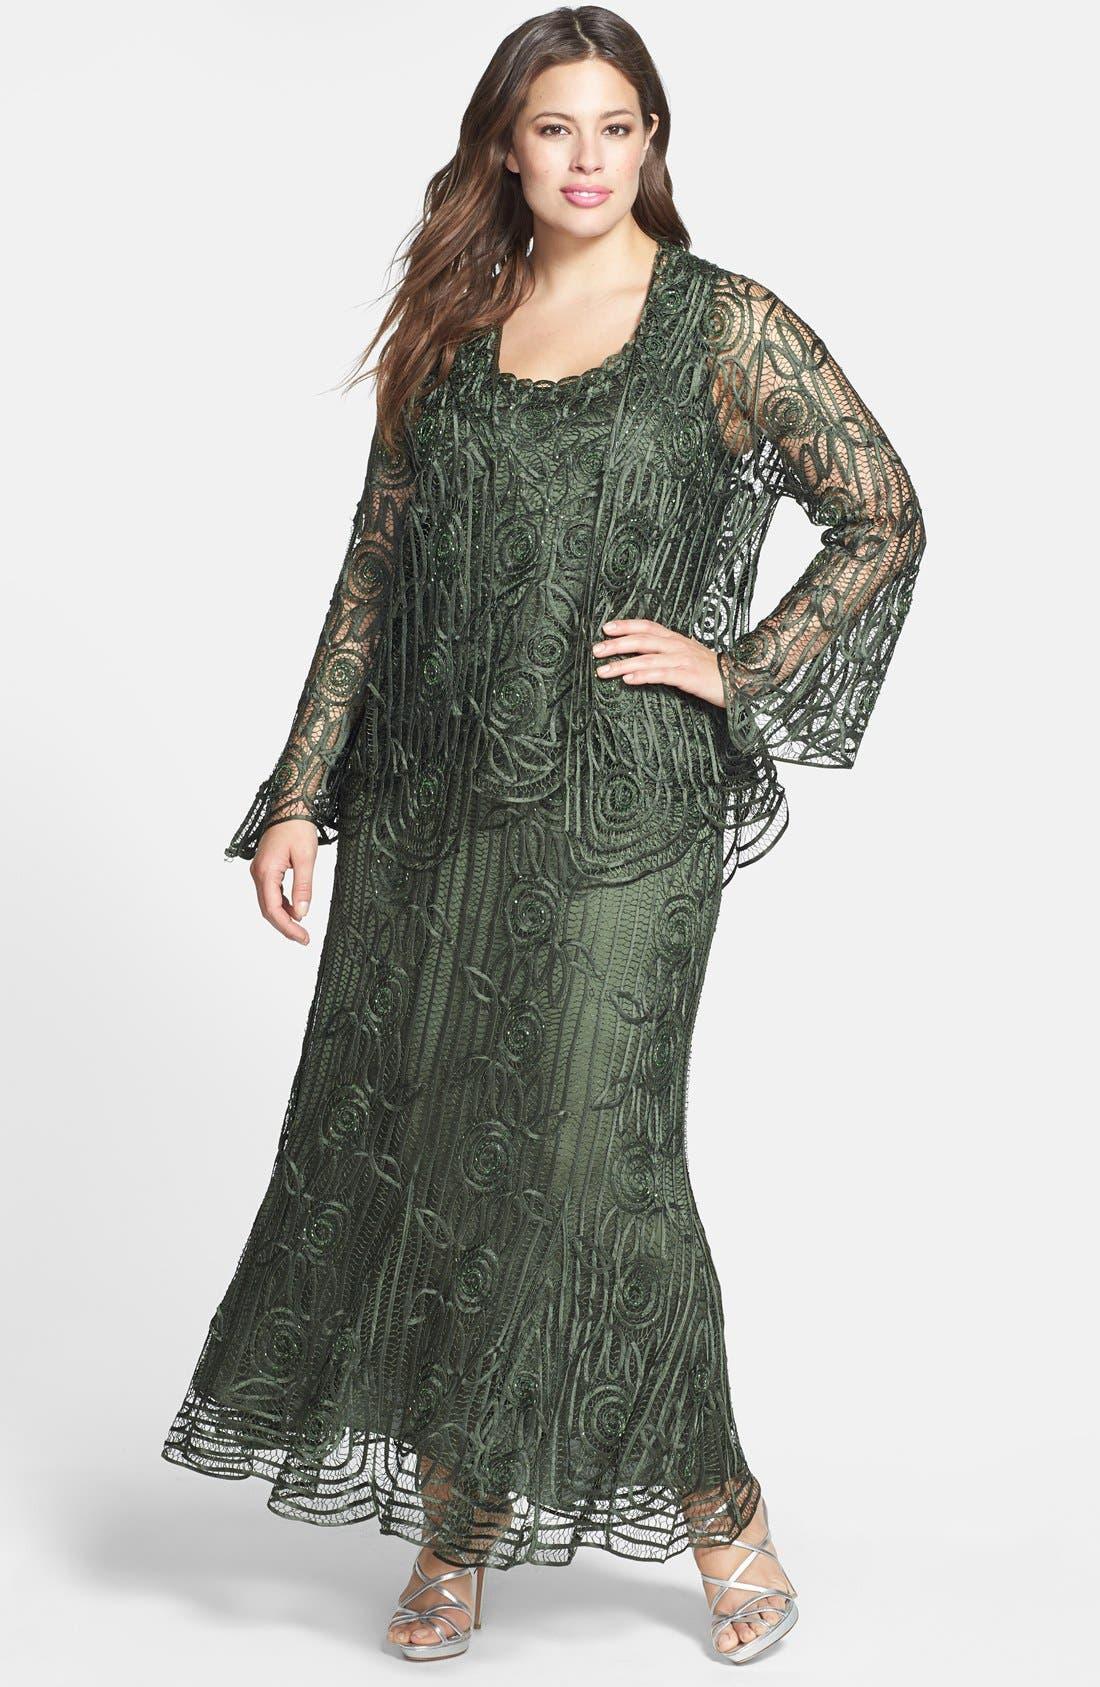 Main Image - Soulmates 3-Piece Silk Crochet Skirt Set (Plus Size)